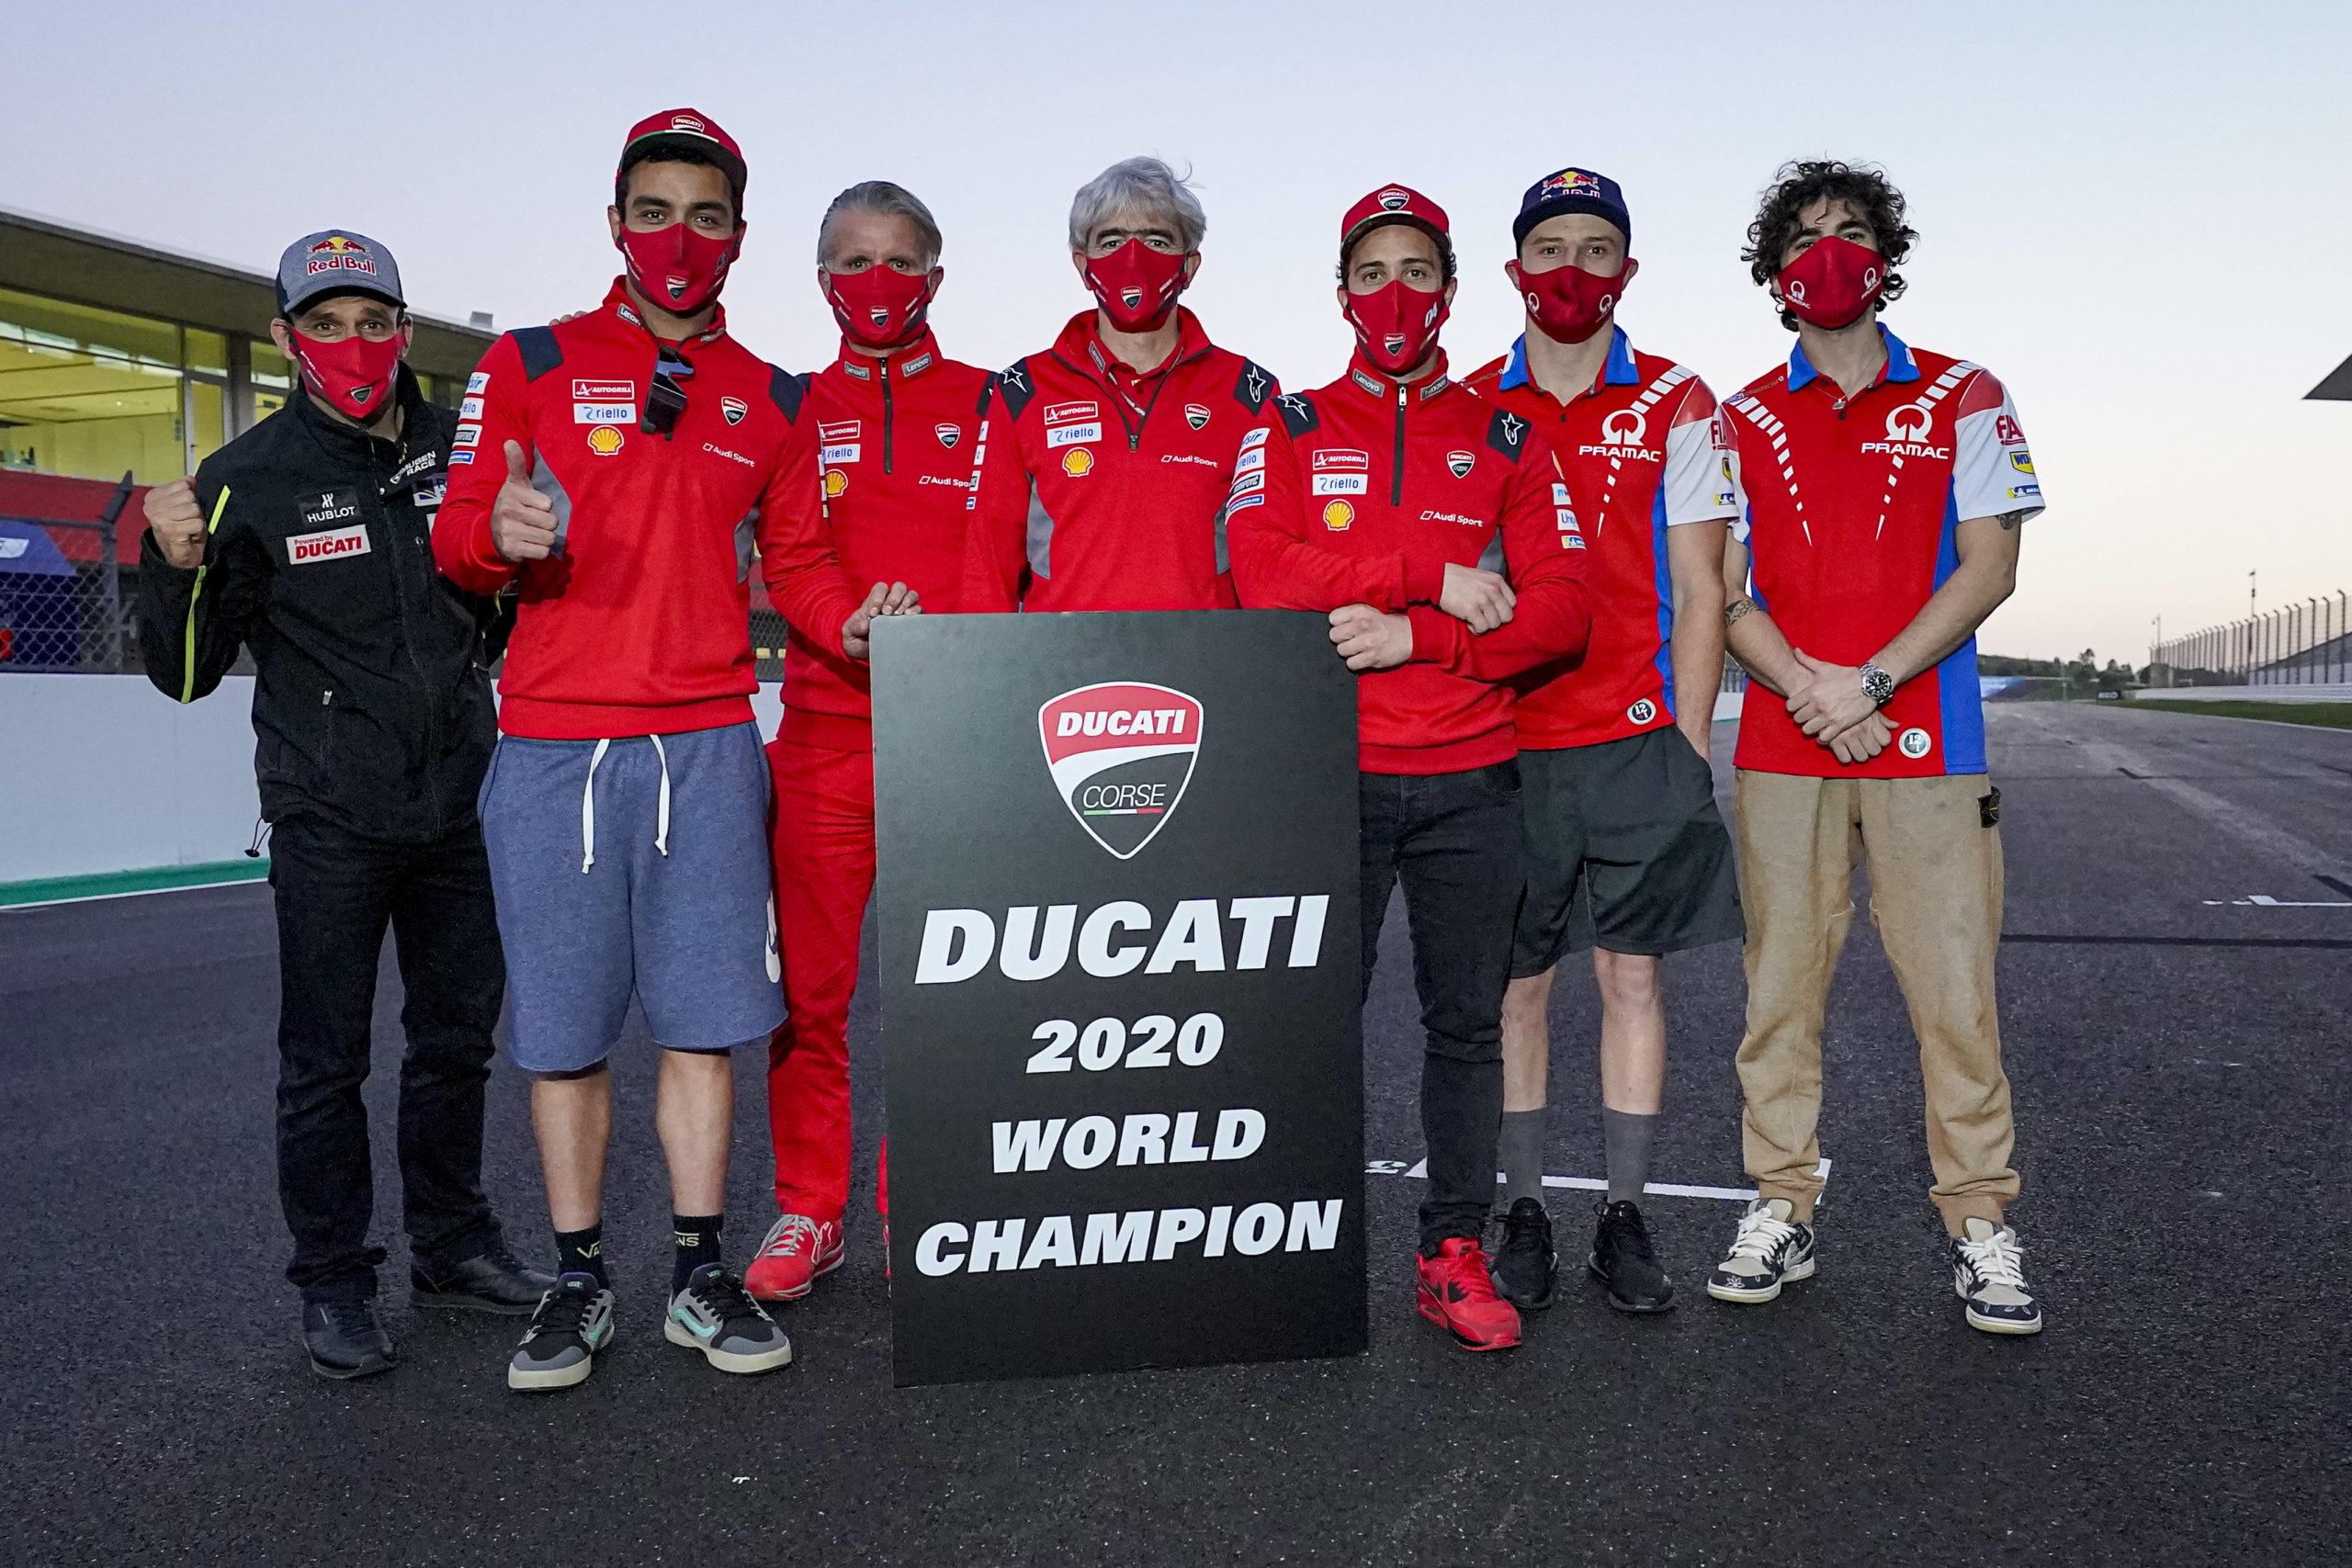 Ducati 2020 World Champion